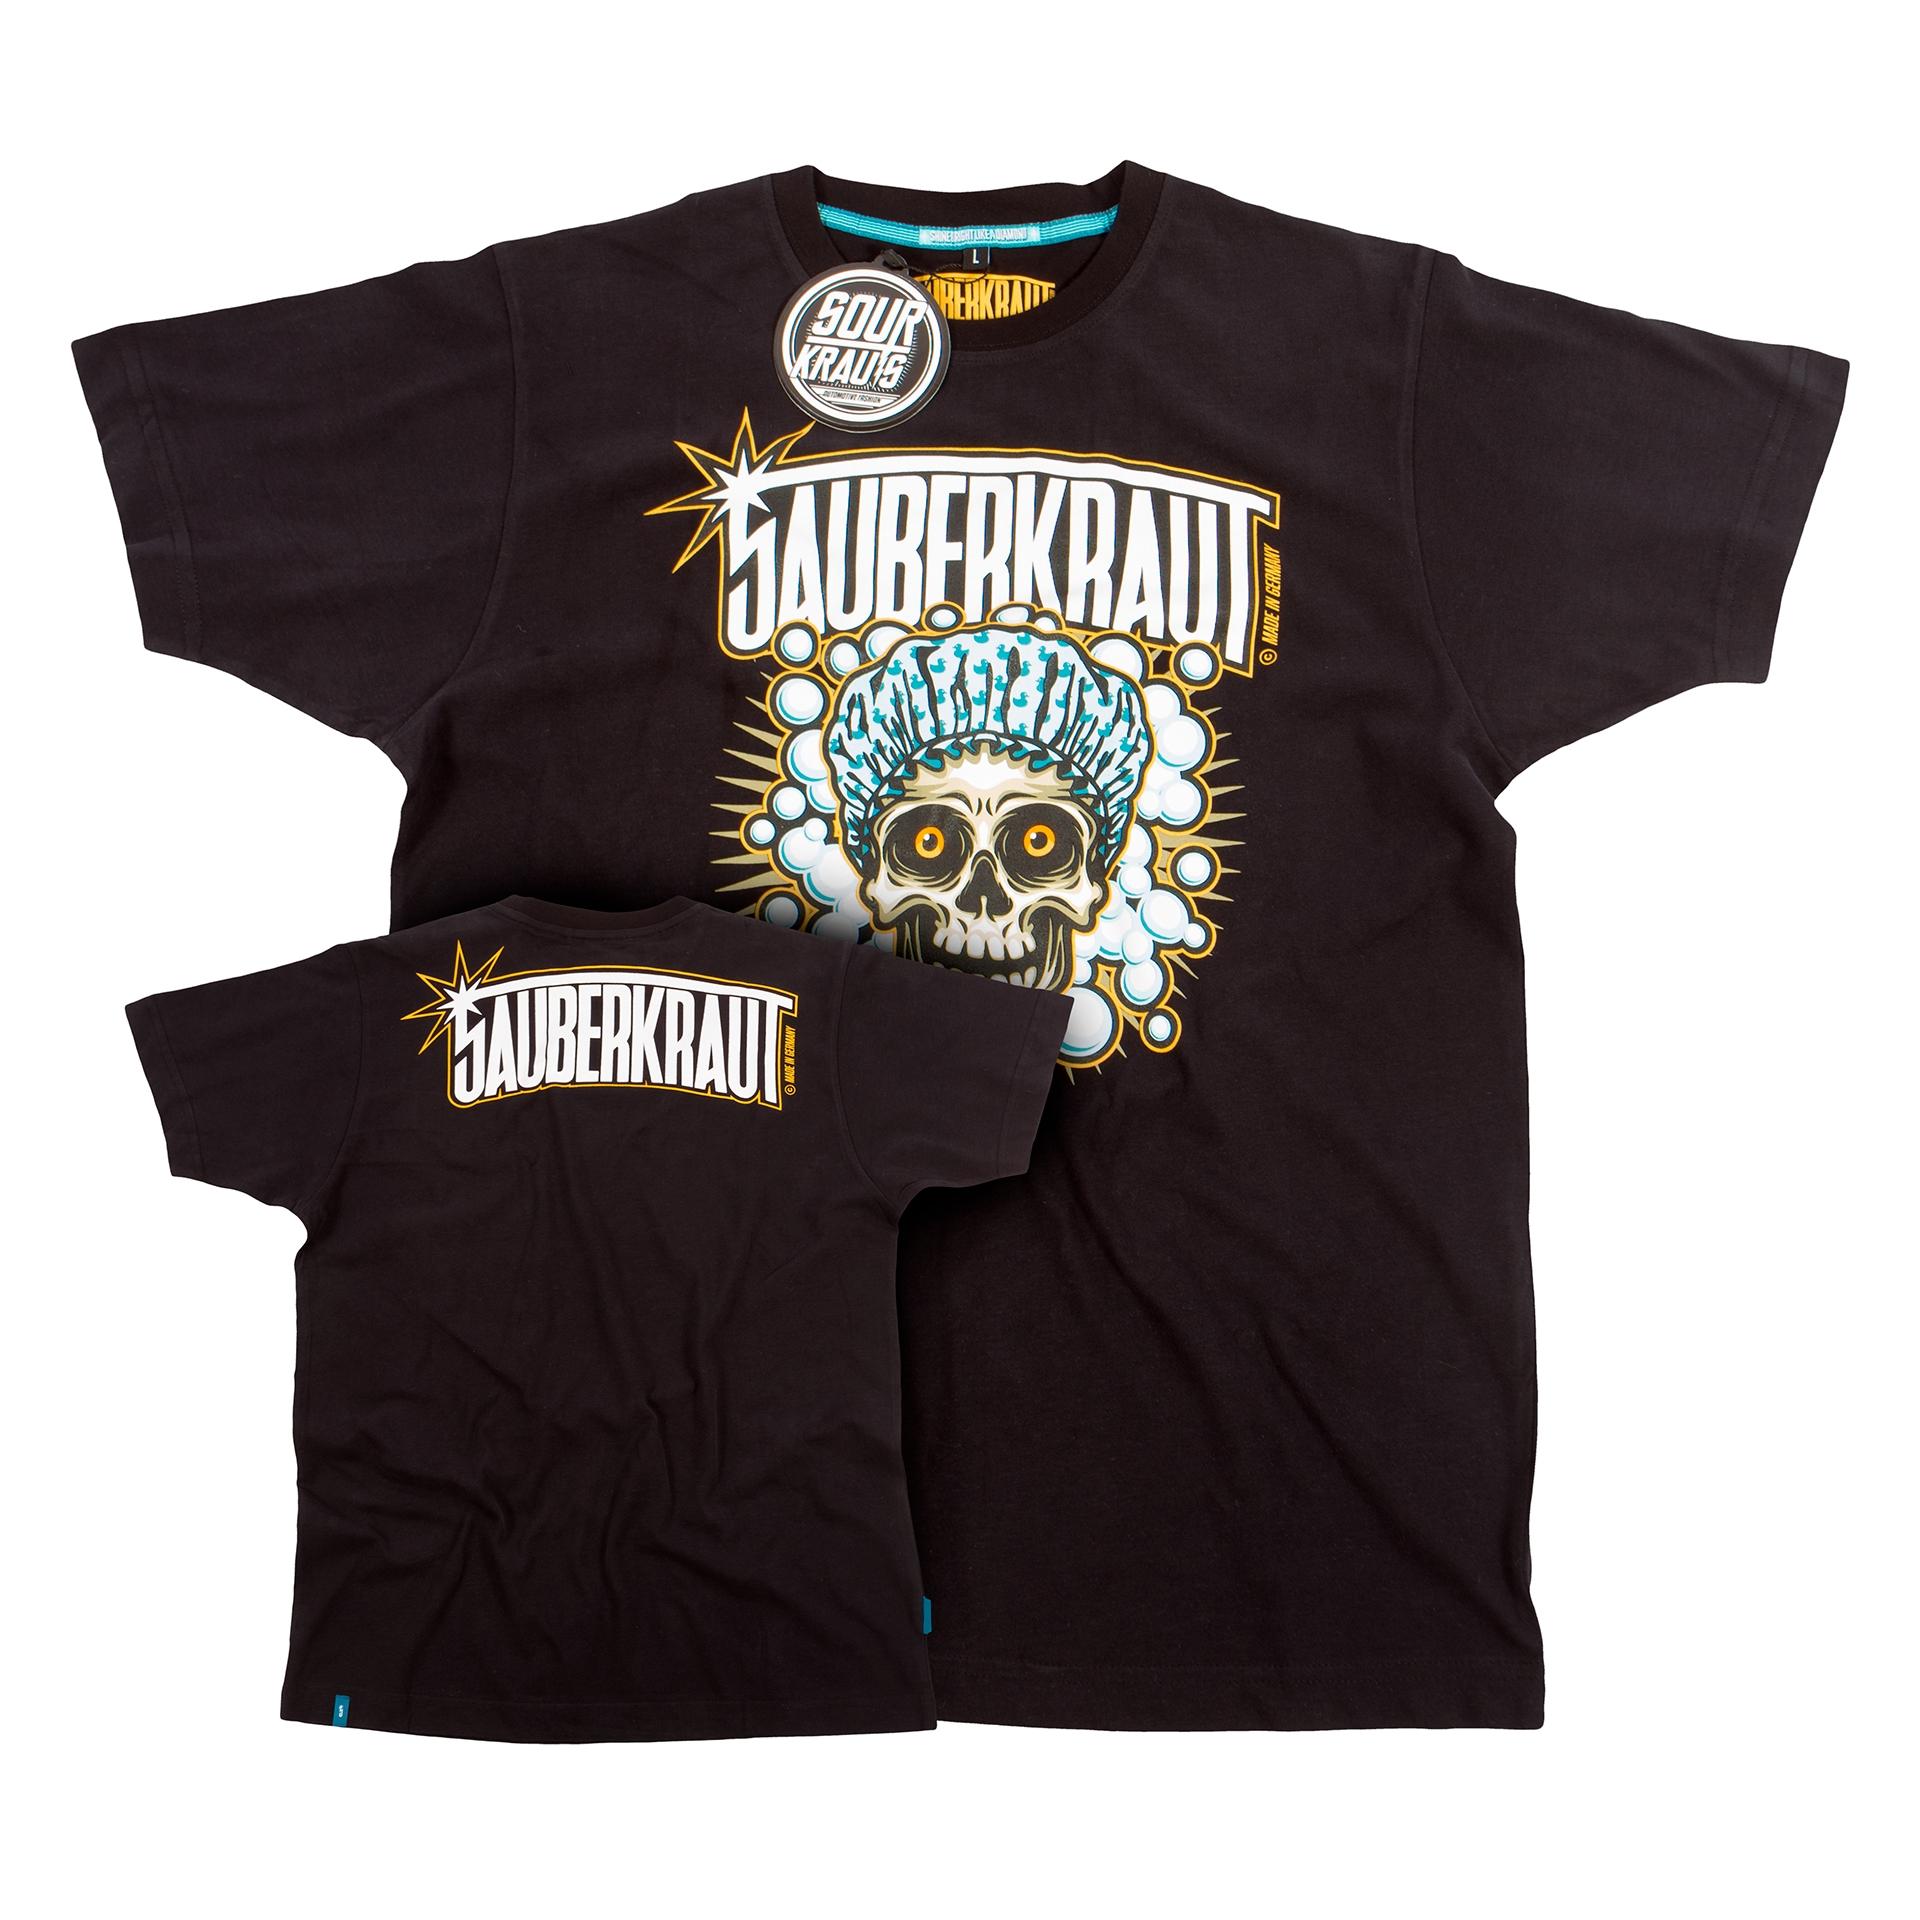 T-Shirt Sauberkraut Schwarz